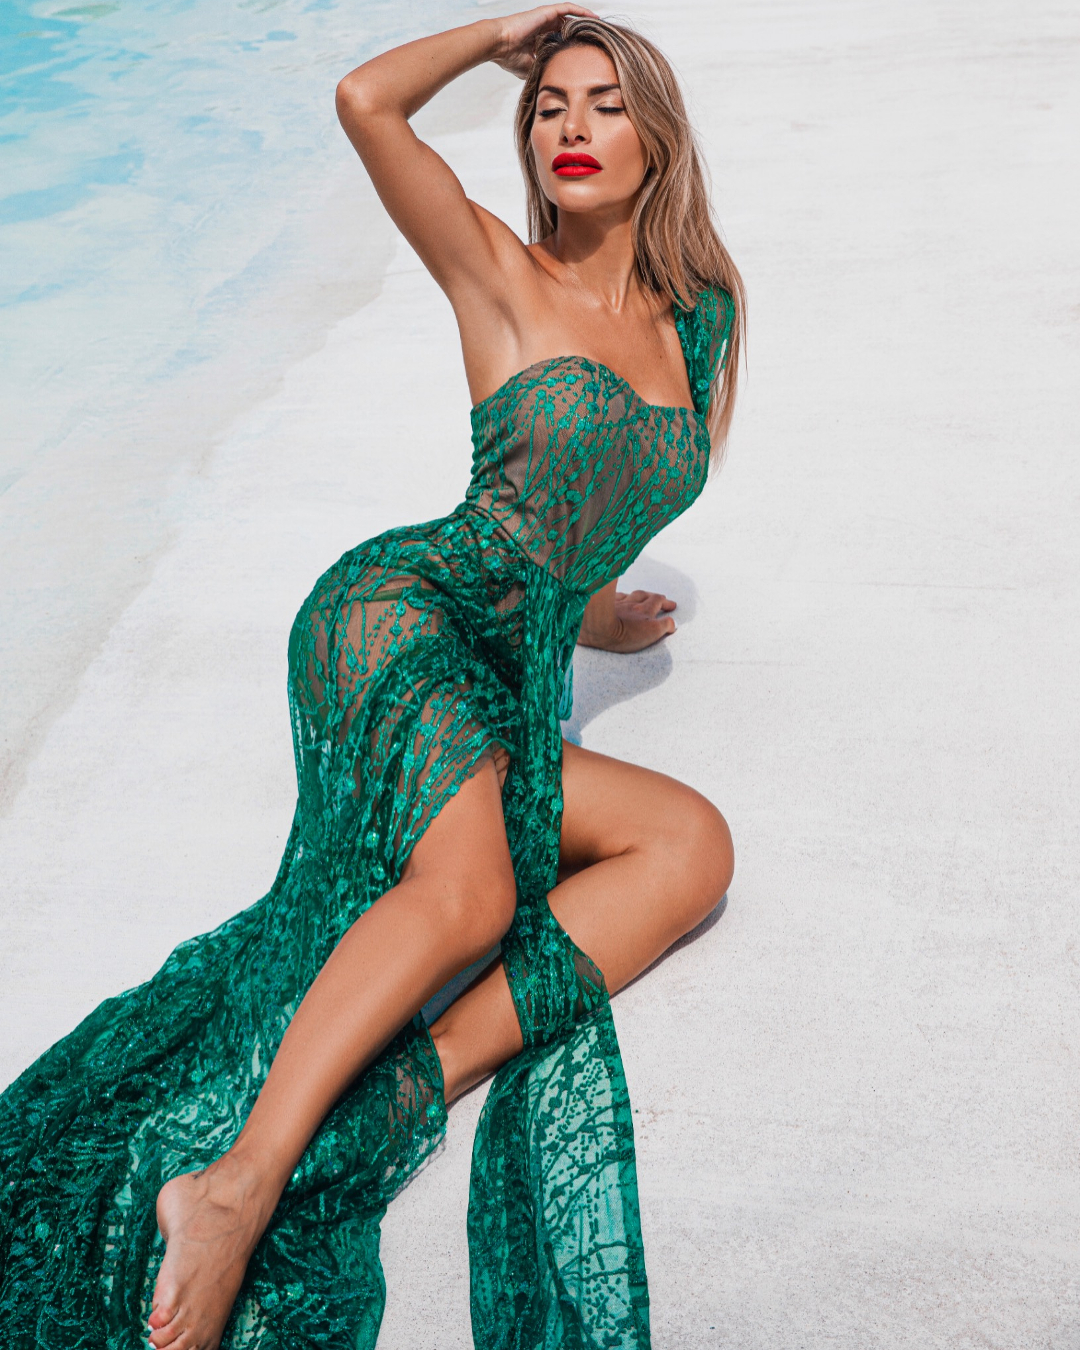 Fernanda Sosa as model and influencer